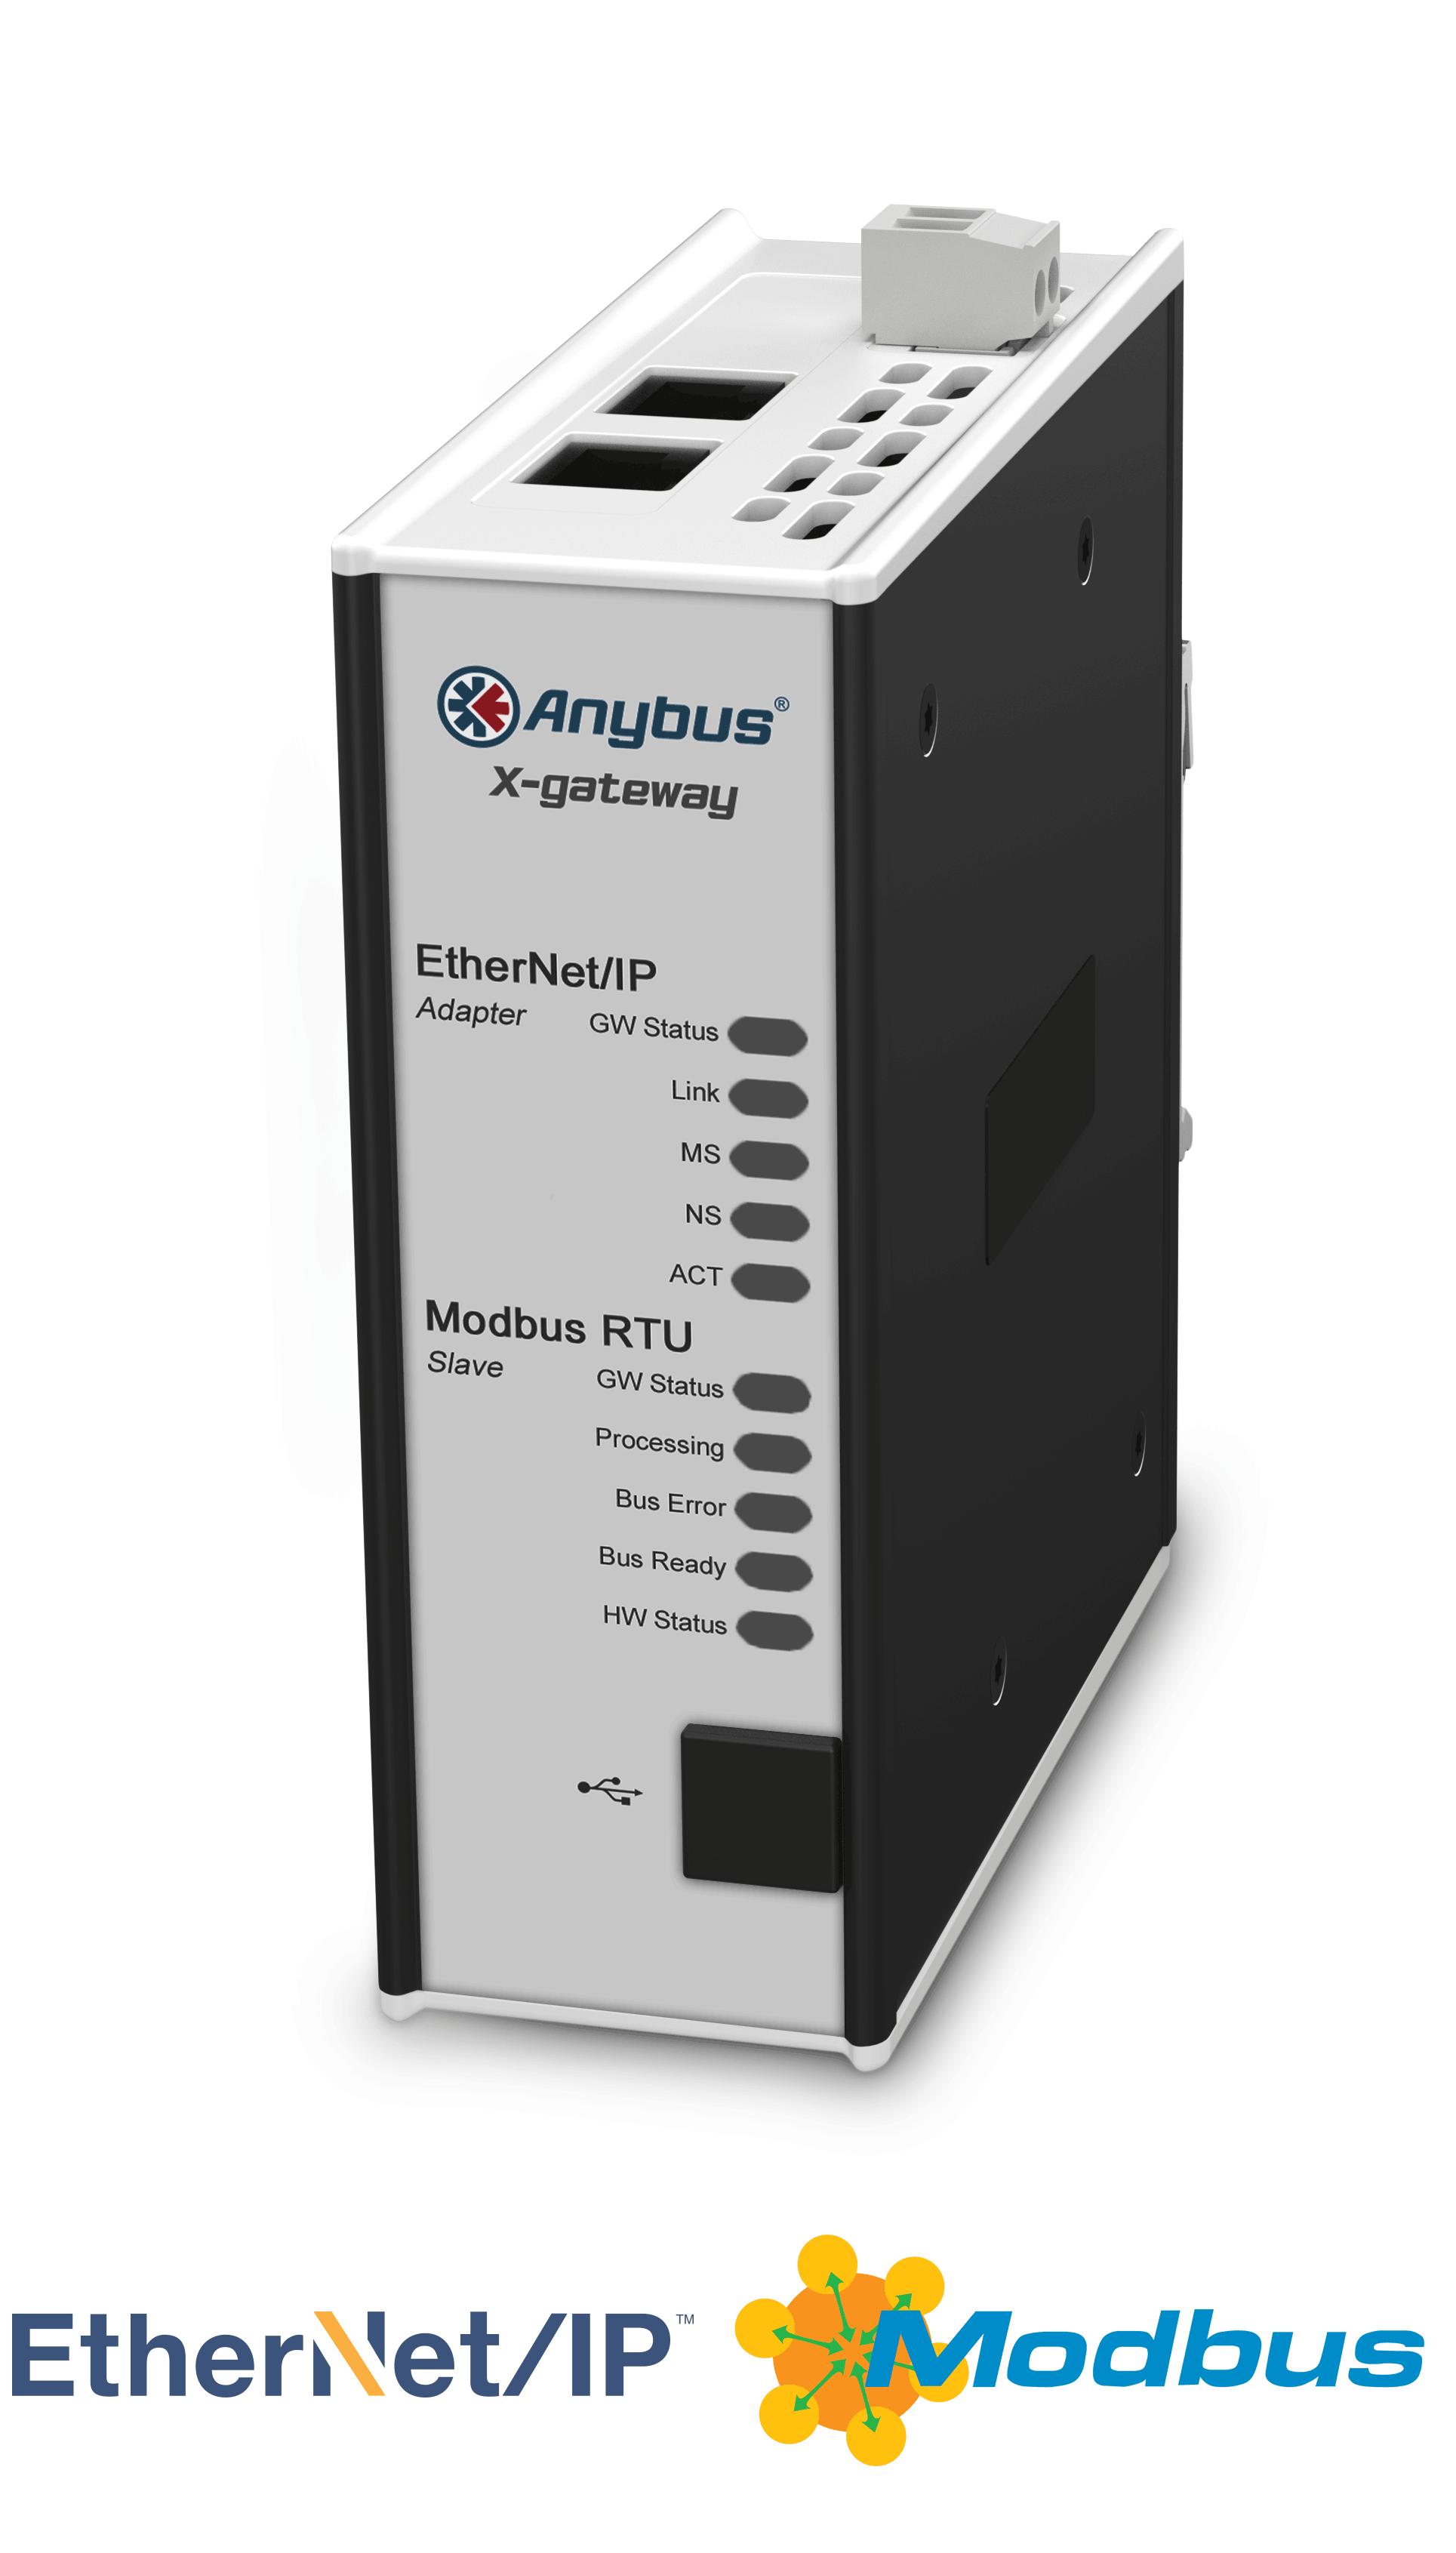 Anybus X-gateway – EtherNet/IP Adapter- Modbus RTU Slave